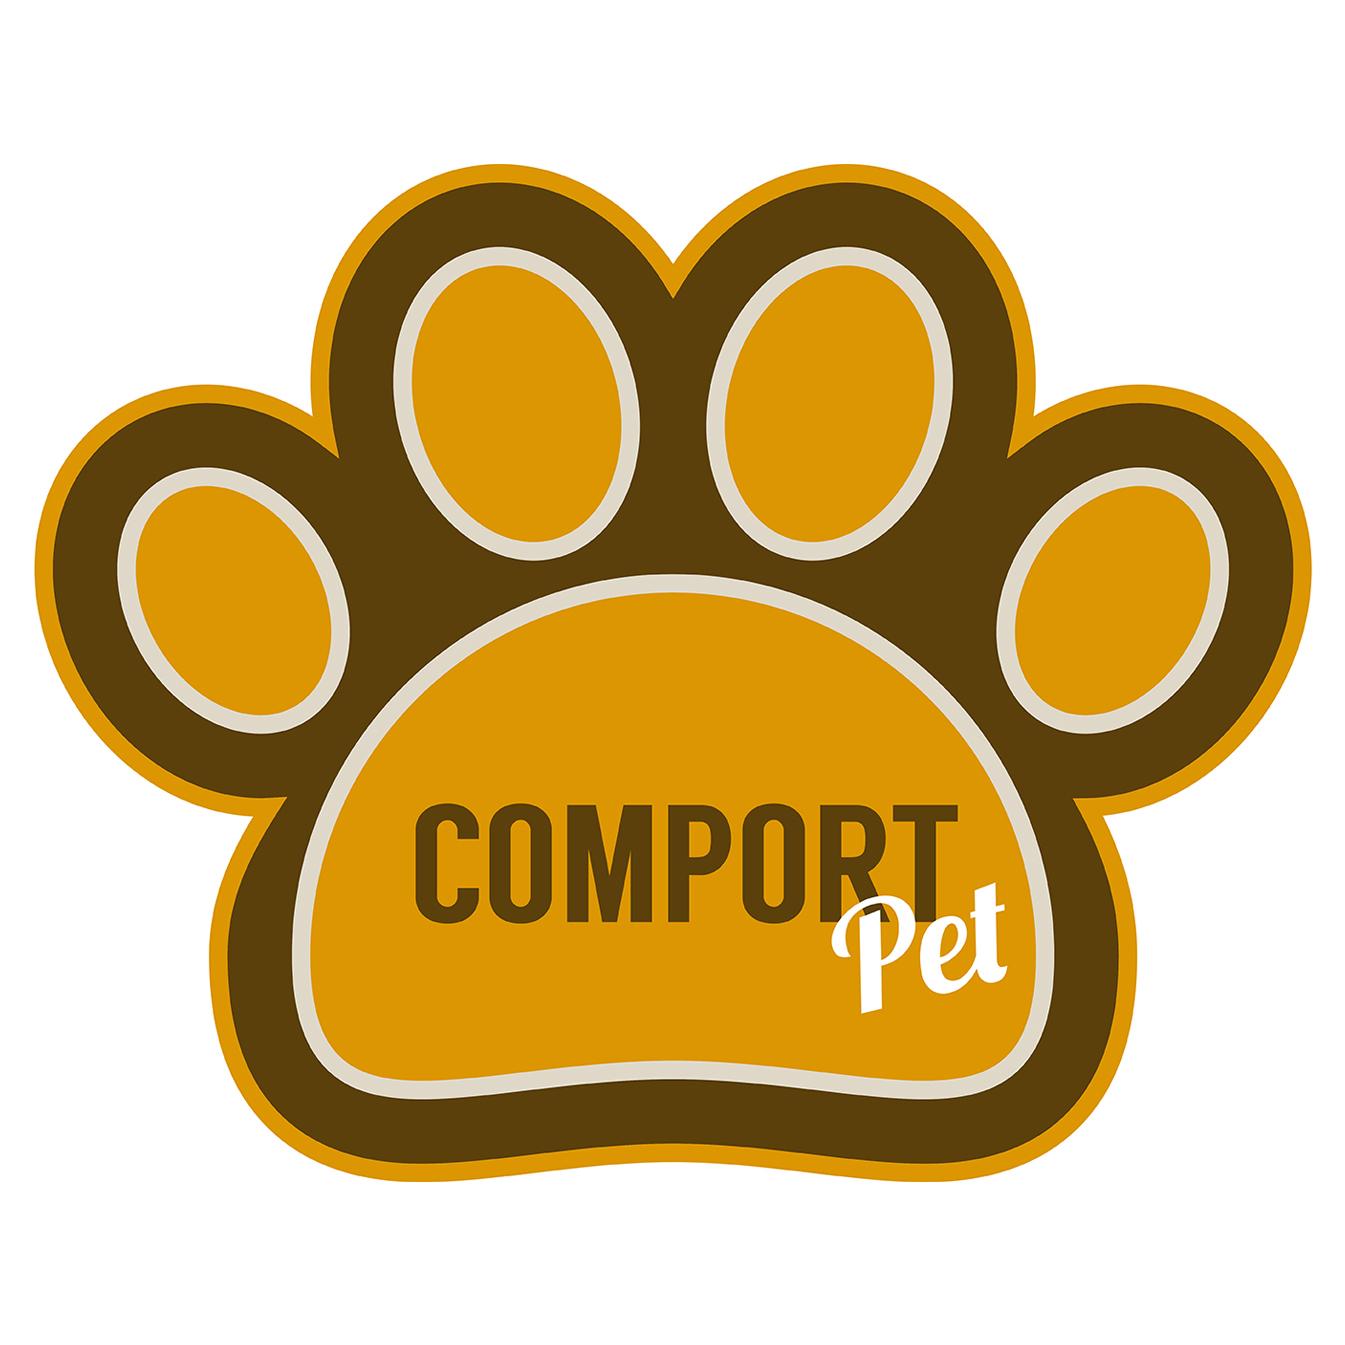 ComportPet